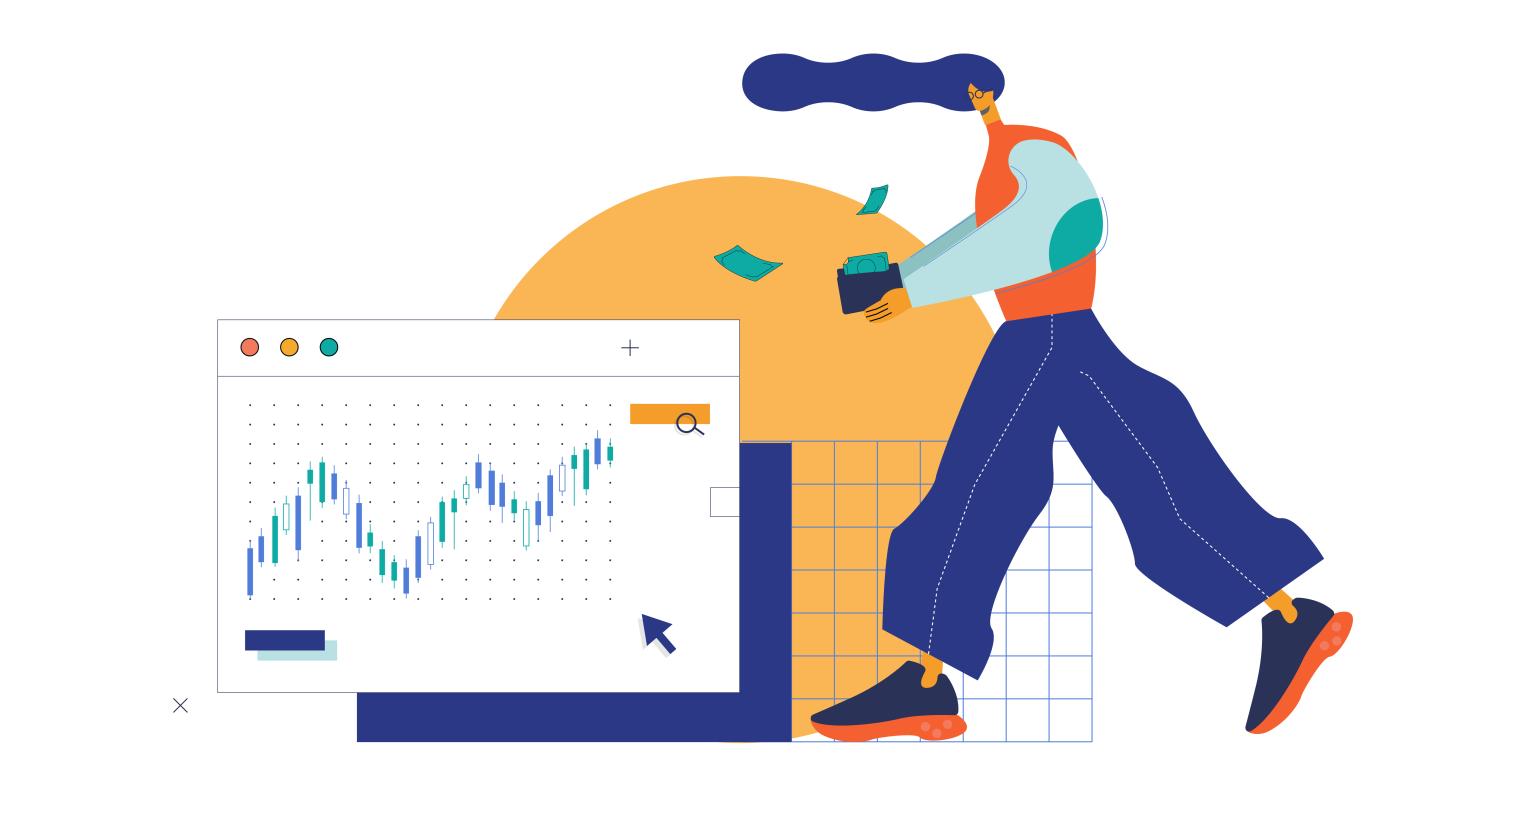 perbedaan social trading, mirror trading dan copy trading